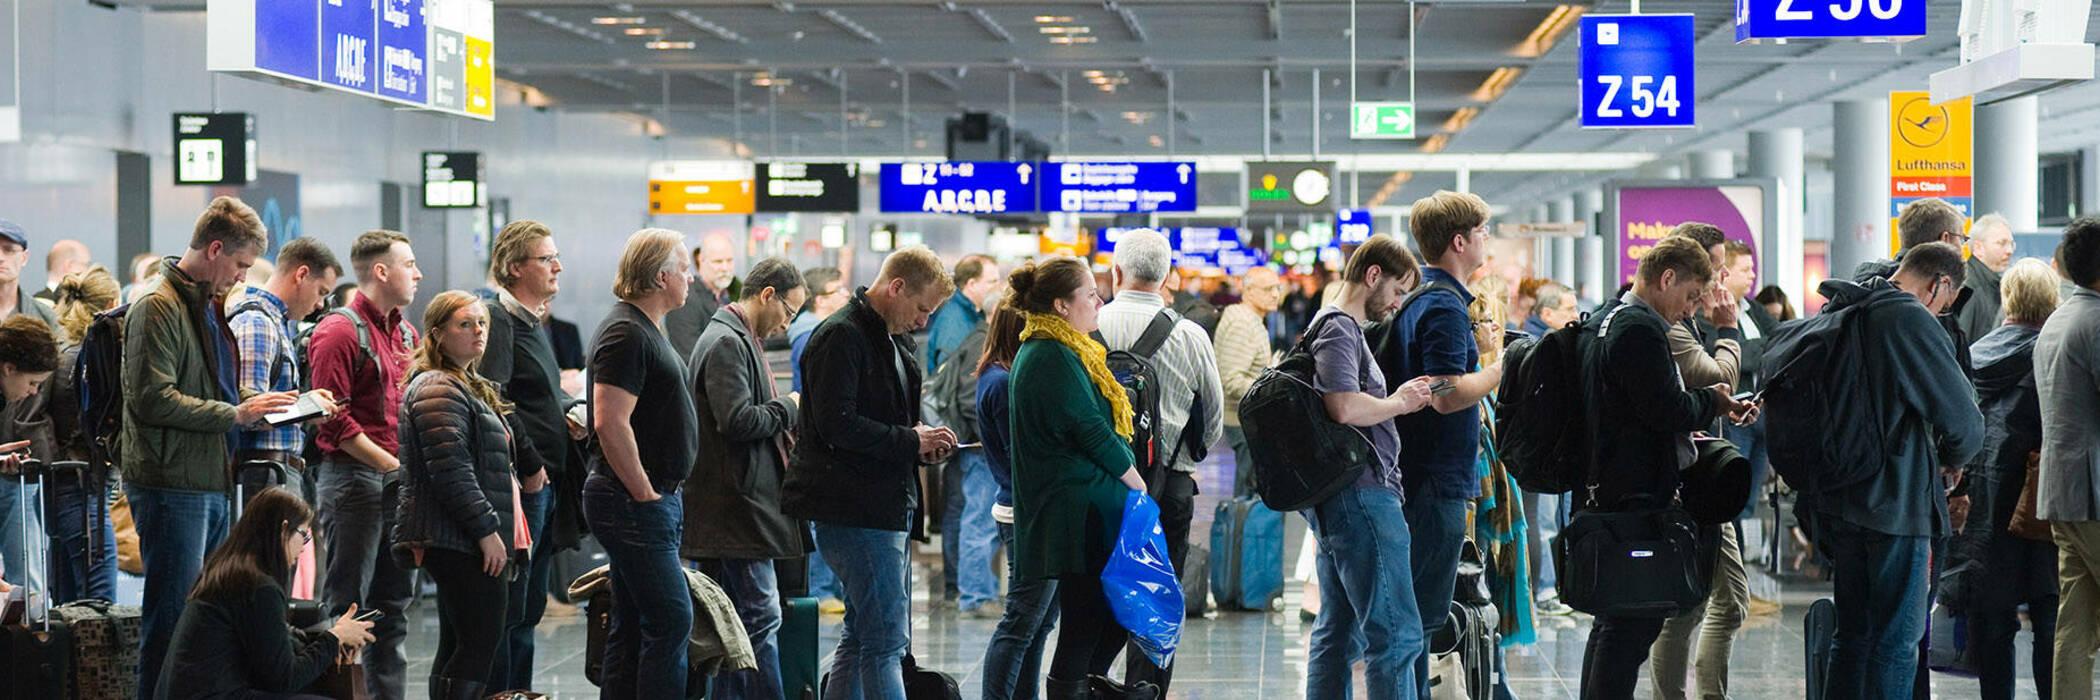 Passengers waiting in airport queue